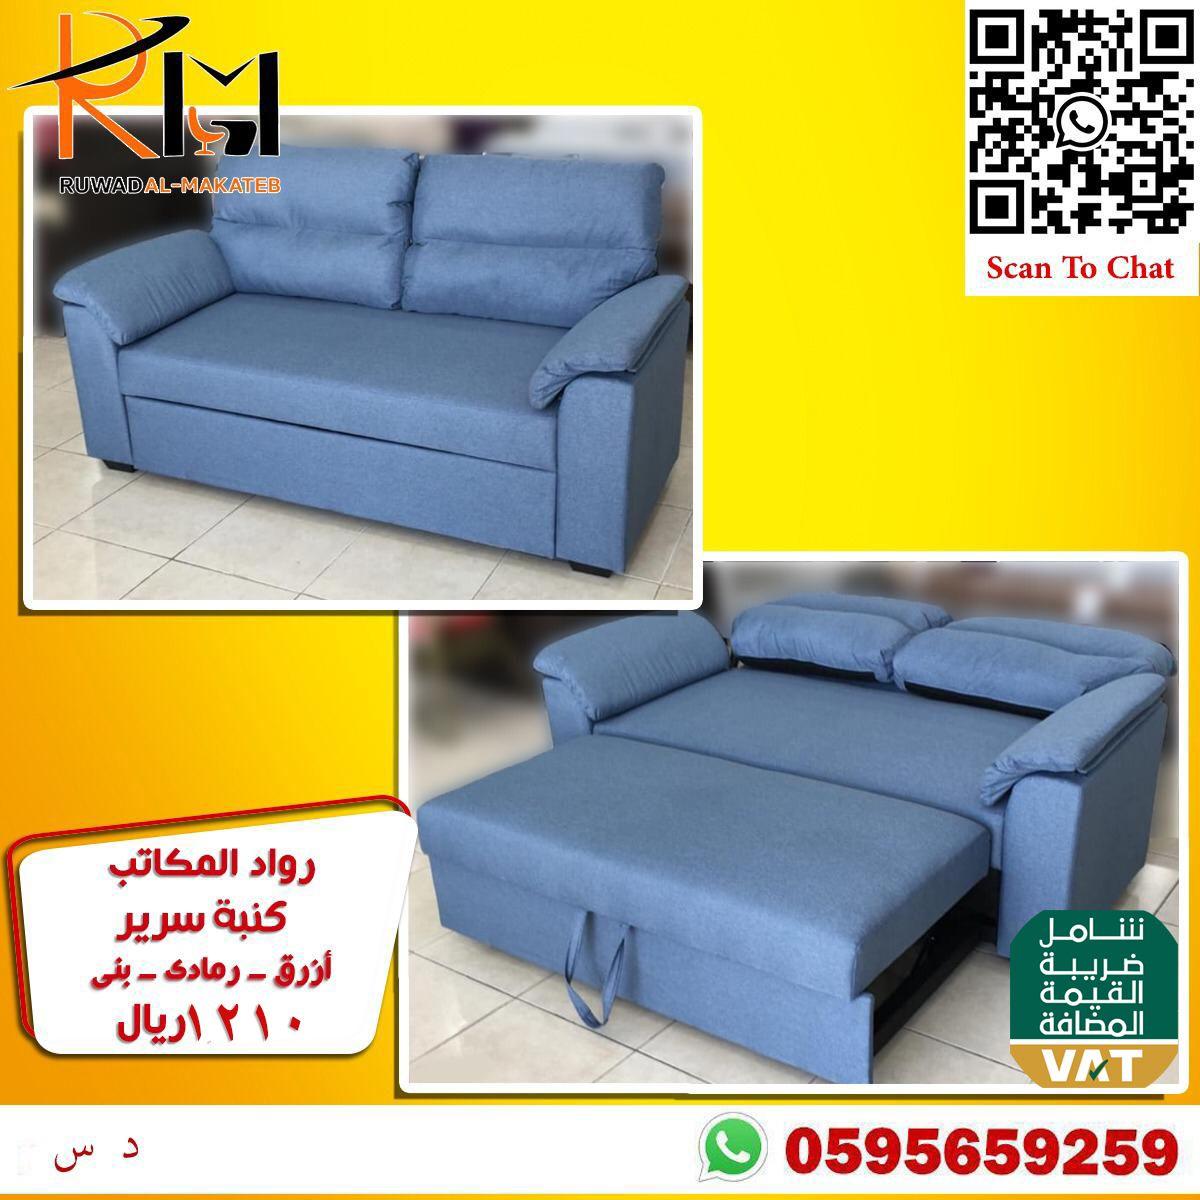 كنبة سرير ازرق In 2021 Sofa Couch Sectional Couch